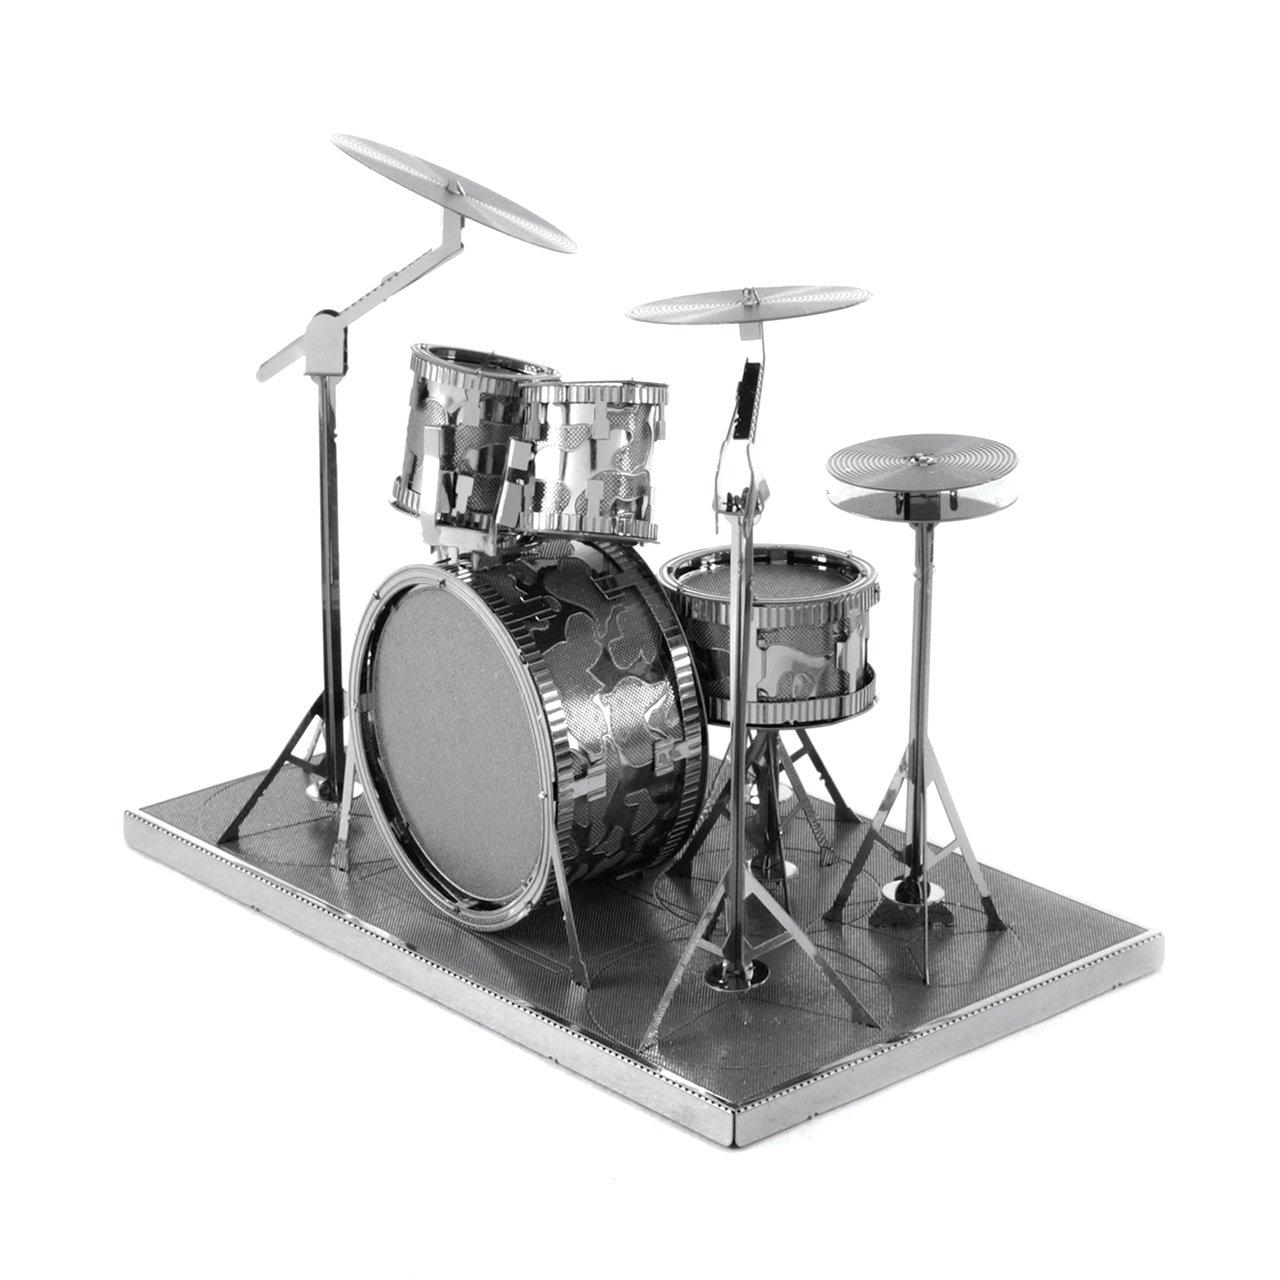 Fascinations Metal Earth Drum Set 3D Metal Model Kit 5284